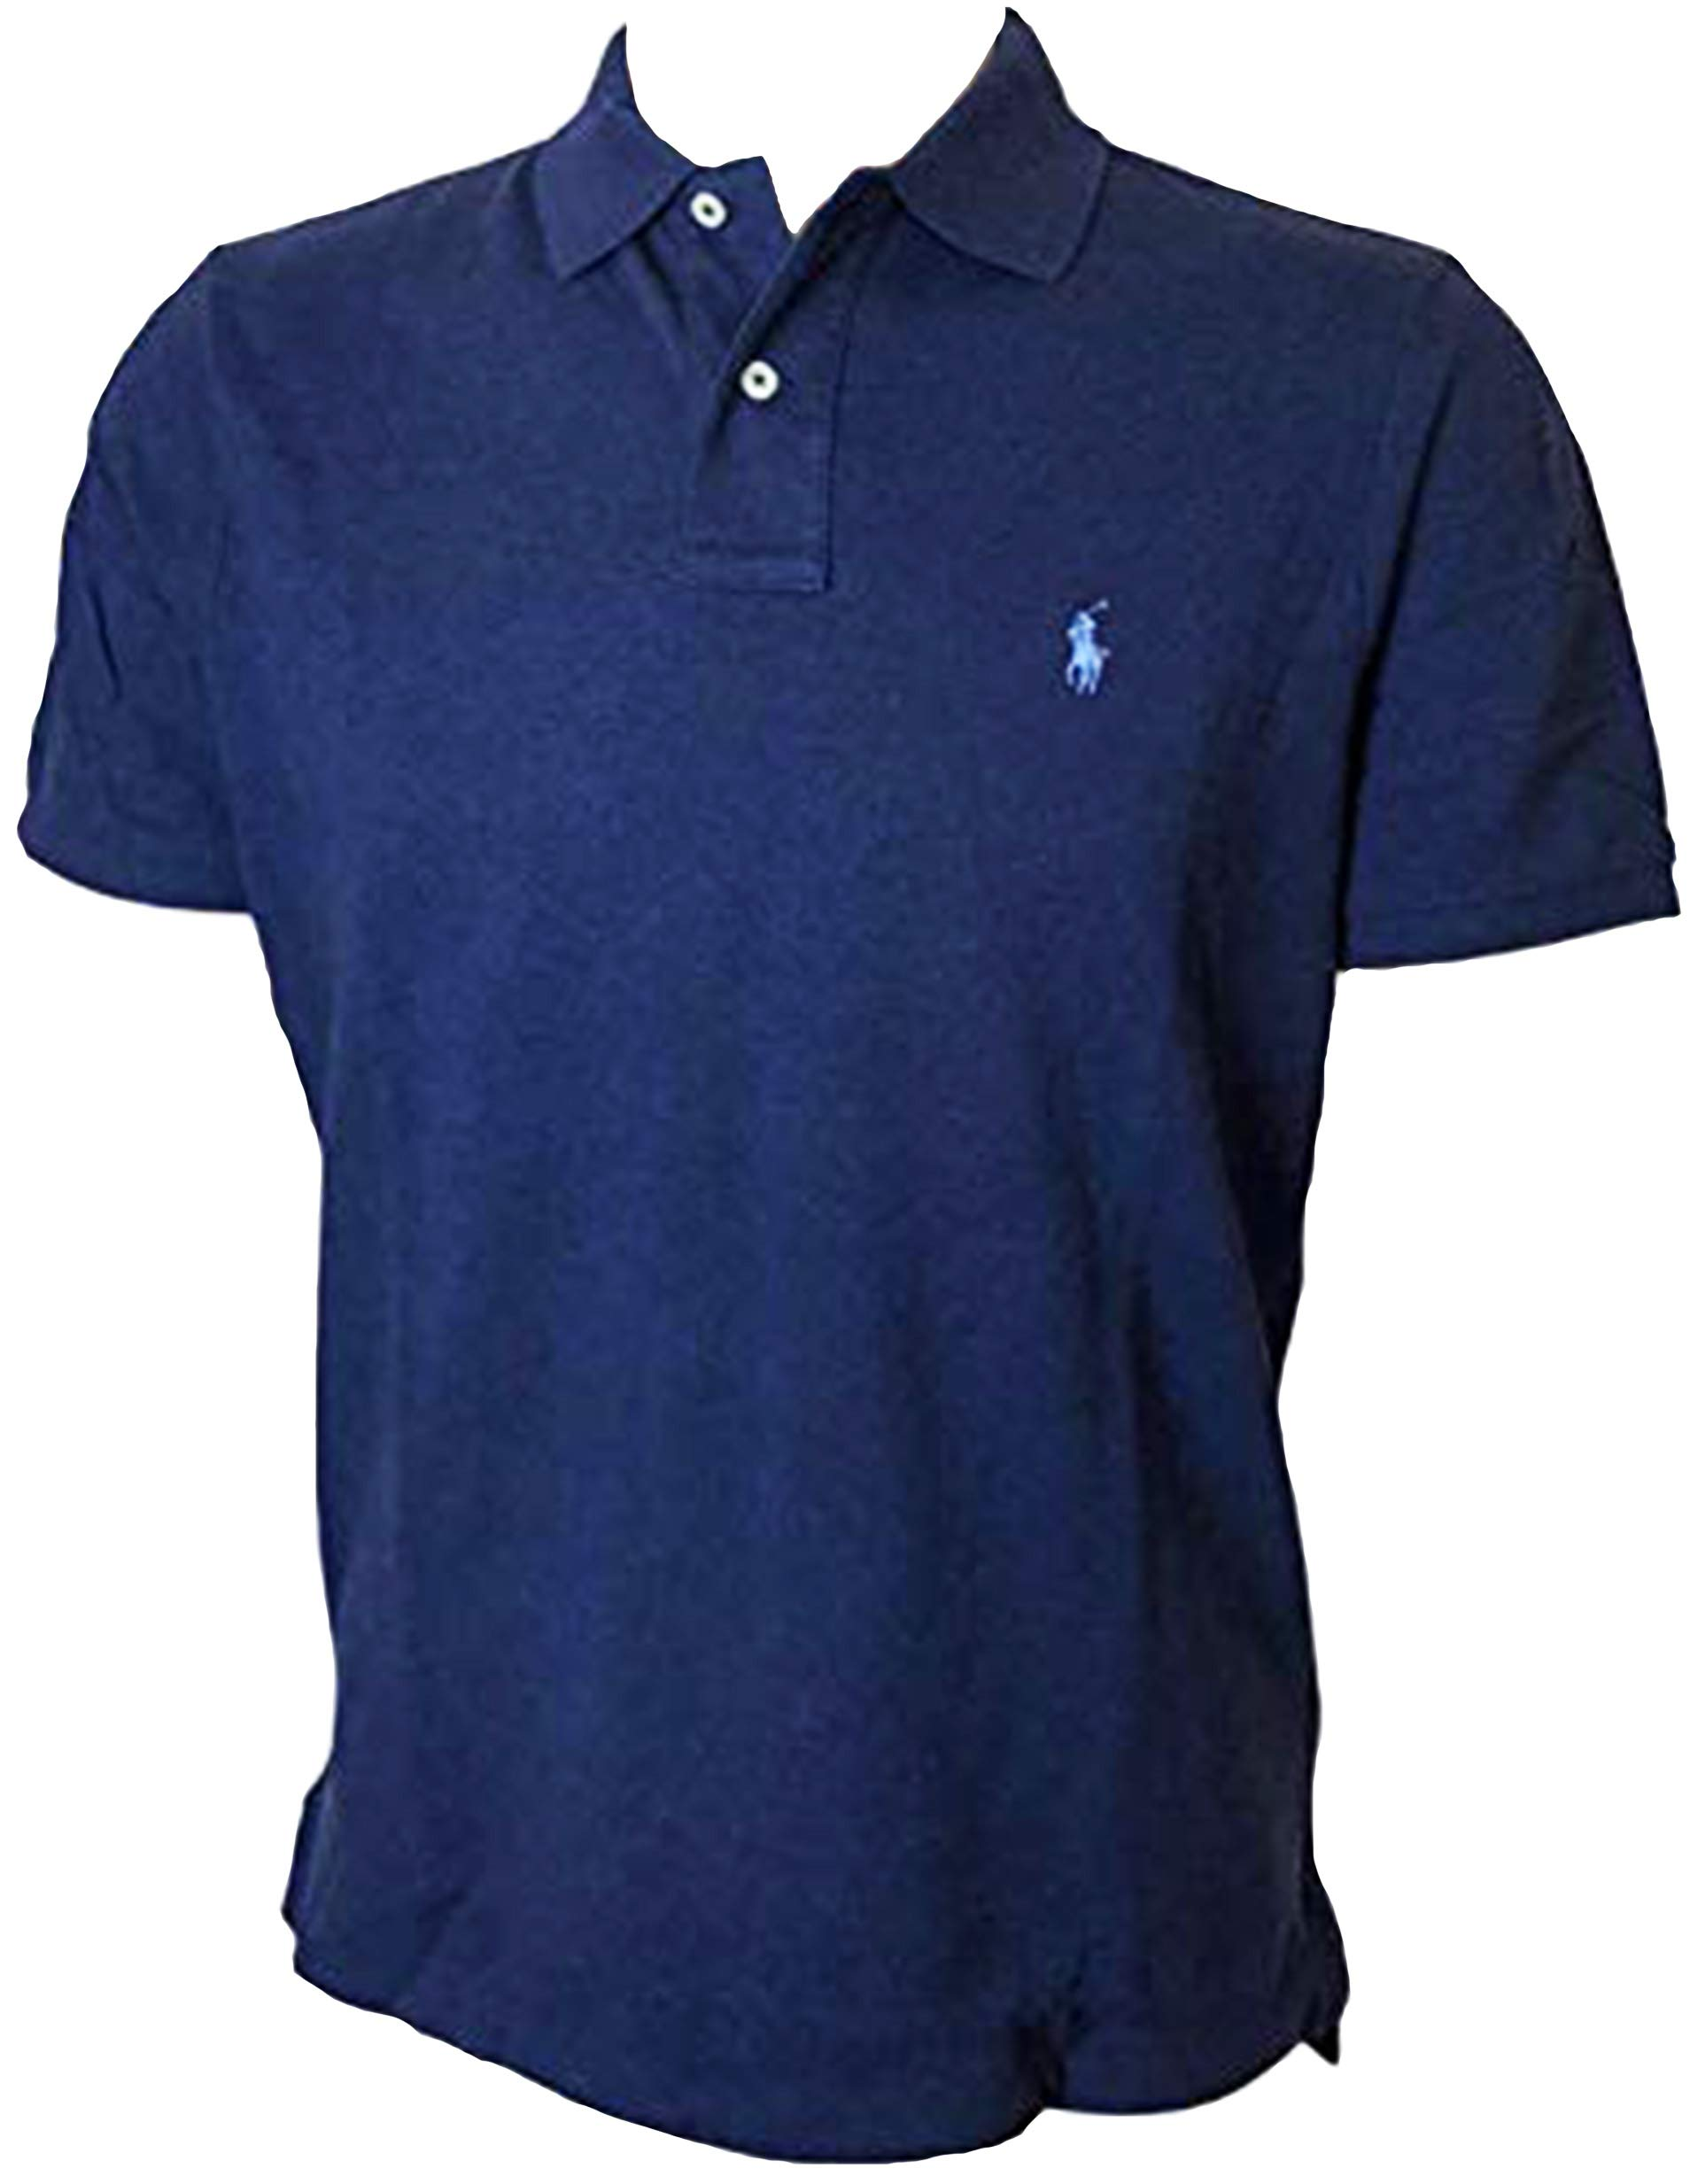 Polo Ralph Lauren Mens Classic Mesh Polo Shirt (XXL, Spring Navy) by Polo Ralph Lauren